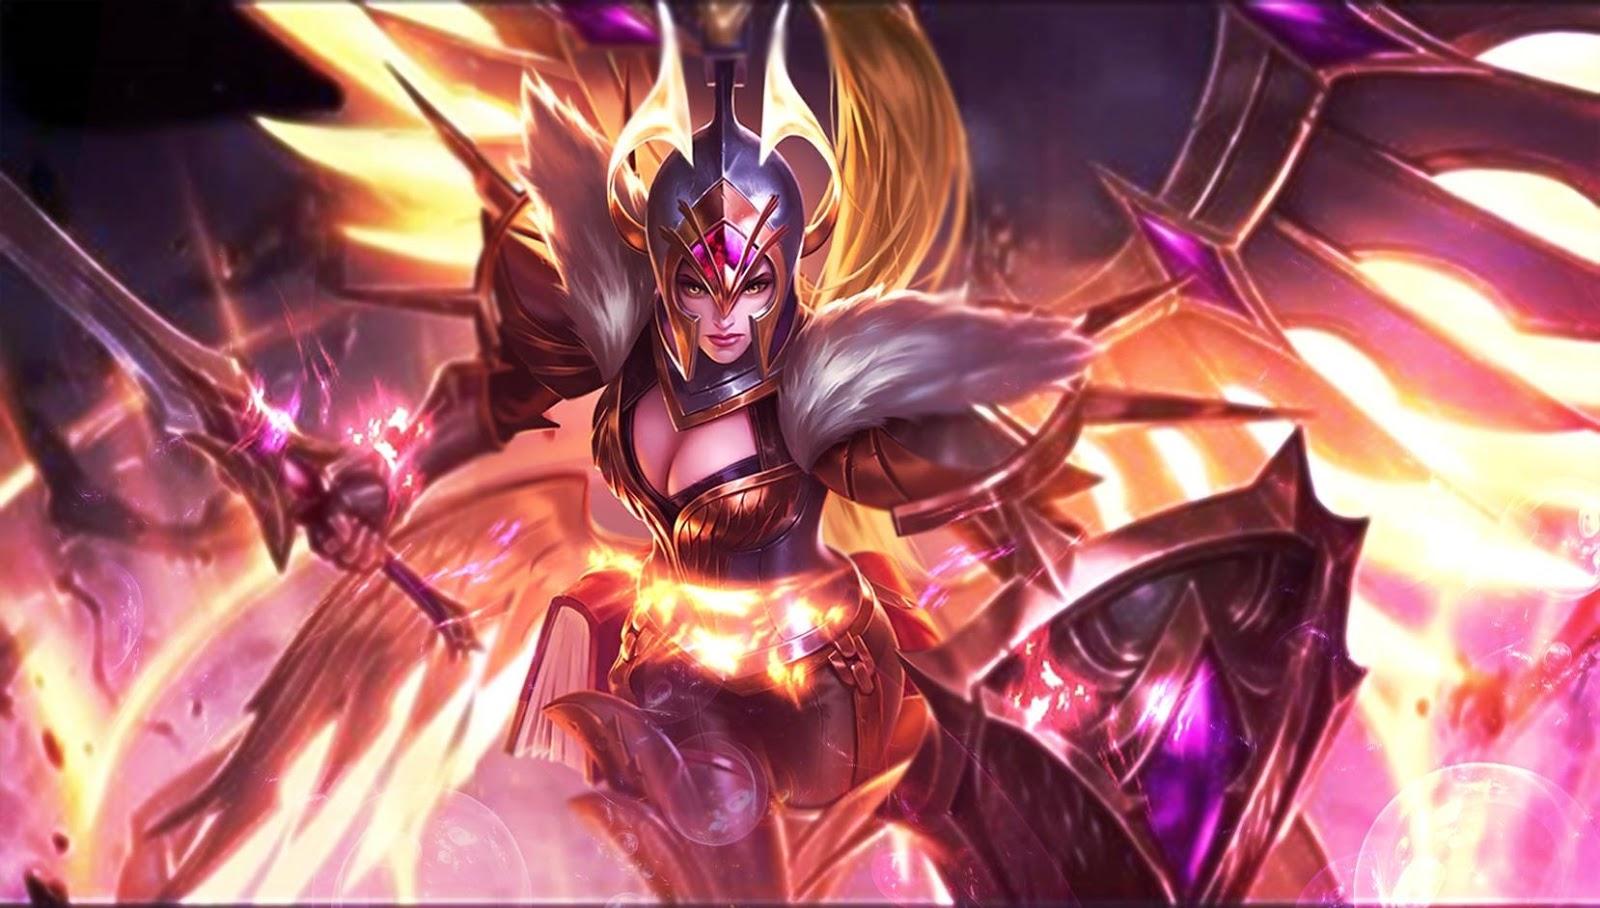 freya-war-angel